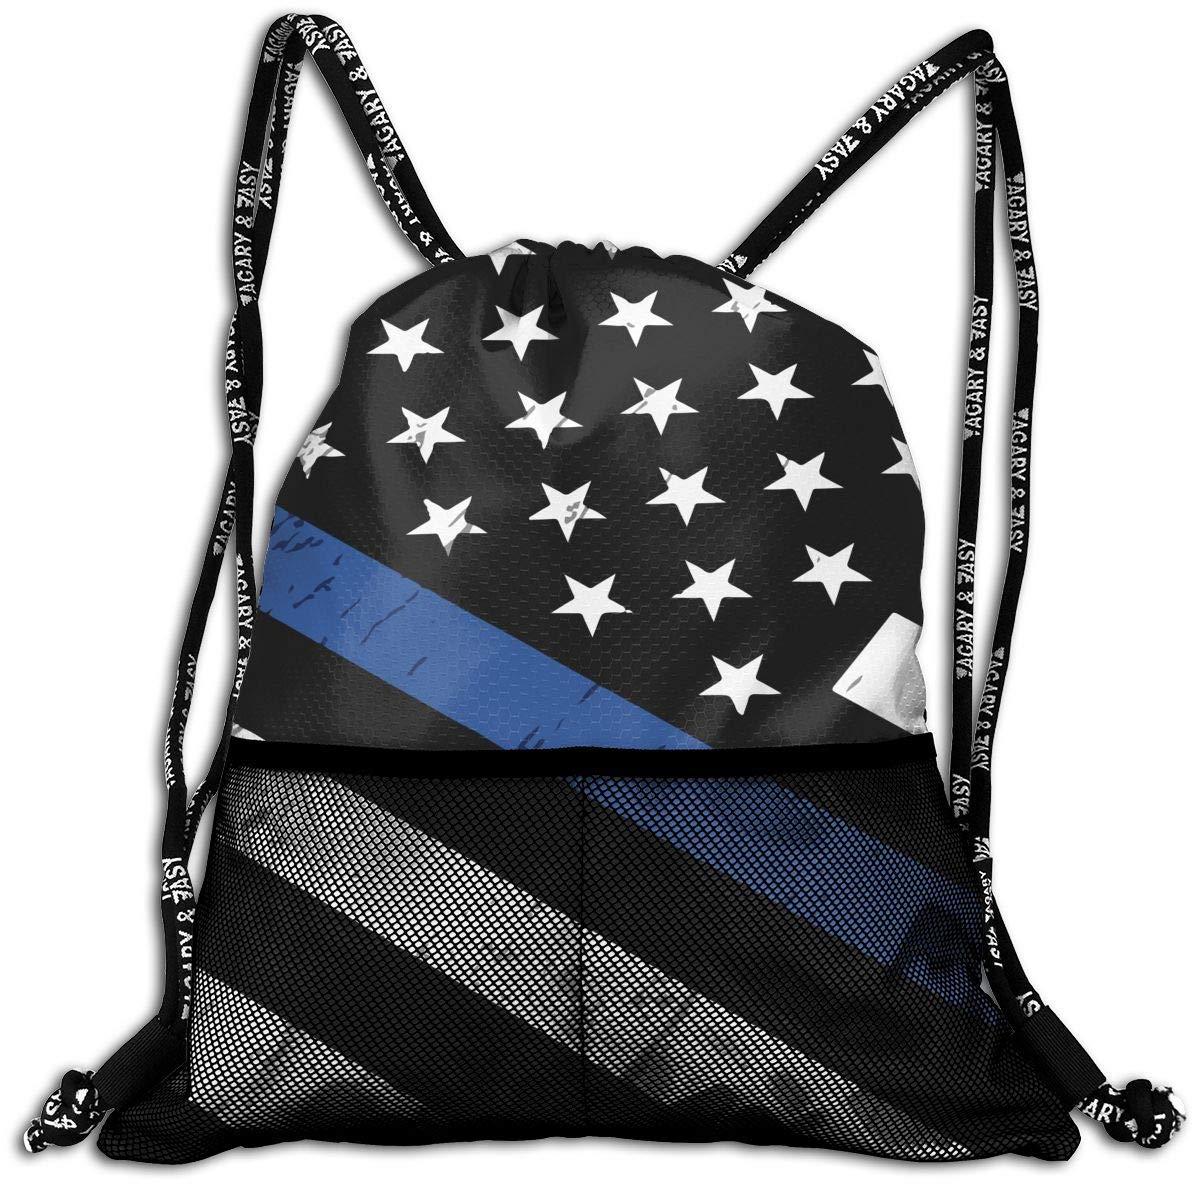 Hipiyoled Police Thin Blue Line Flag Durable Sport Drawstring Backpack for School Soccer Yoga